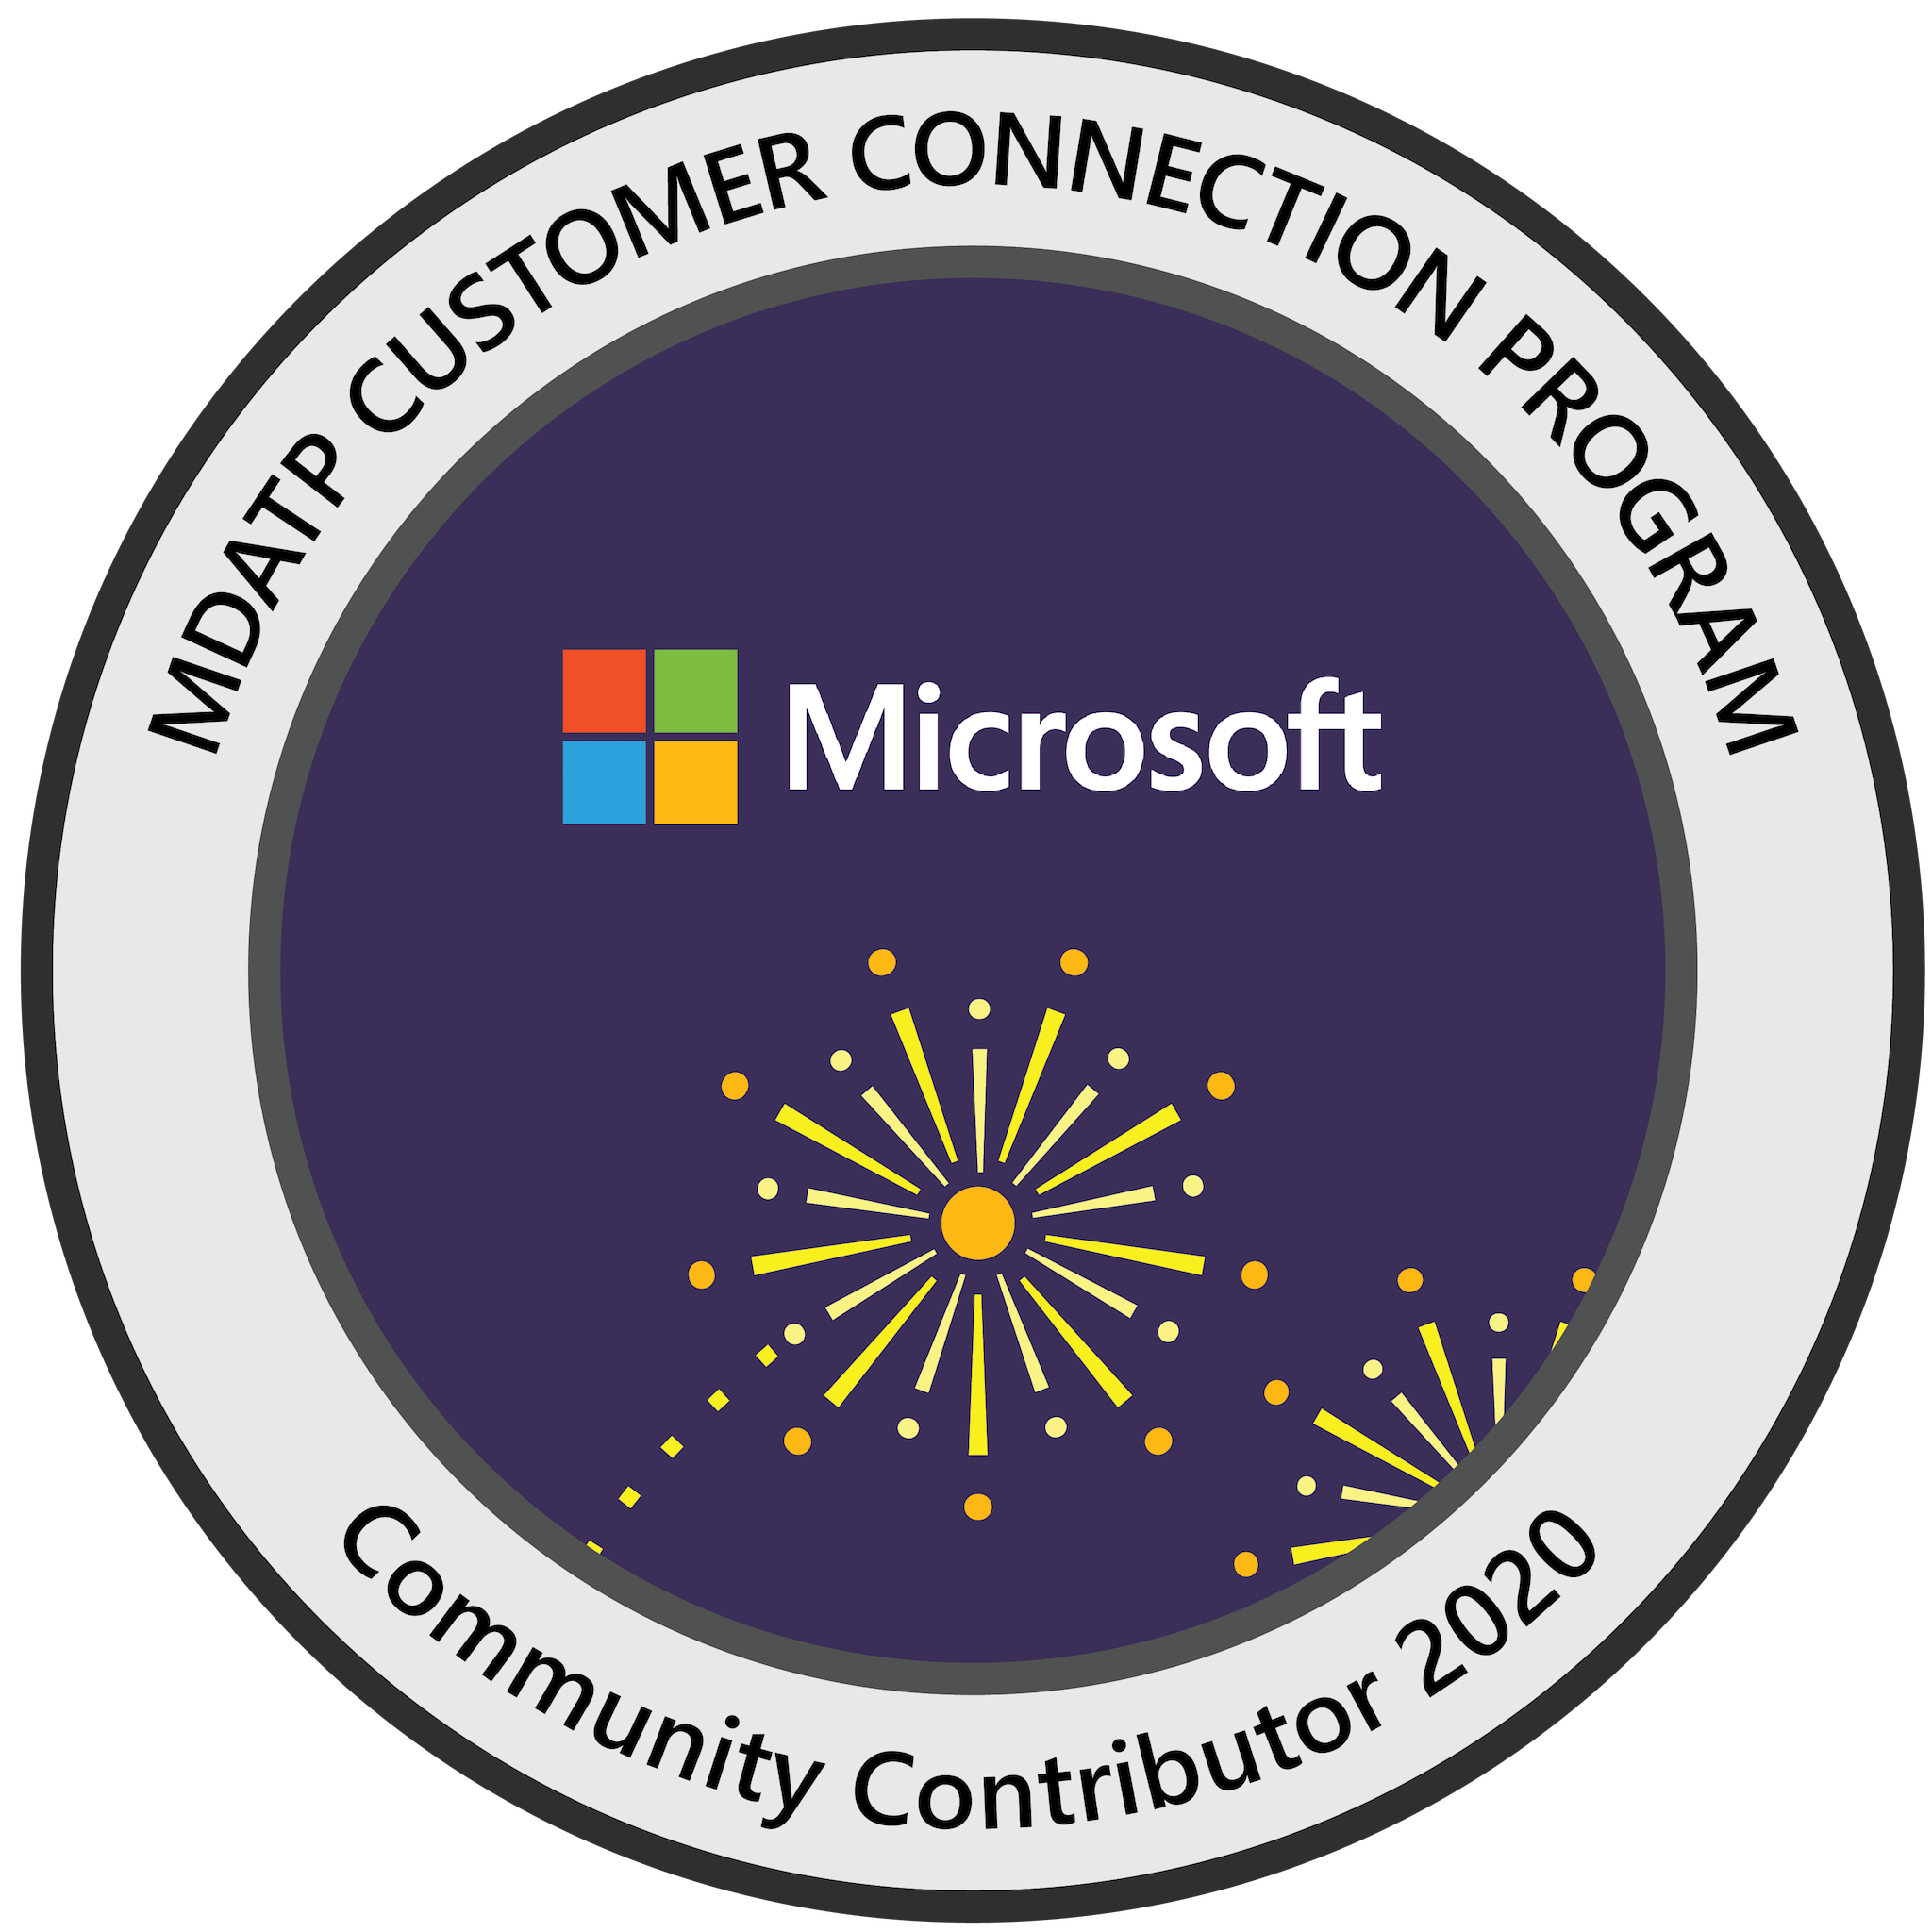 Microsoft Defender ATP Customer Connection Program: Community Contributor 2020